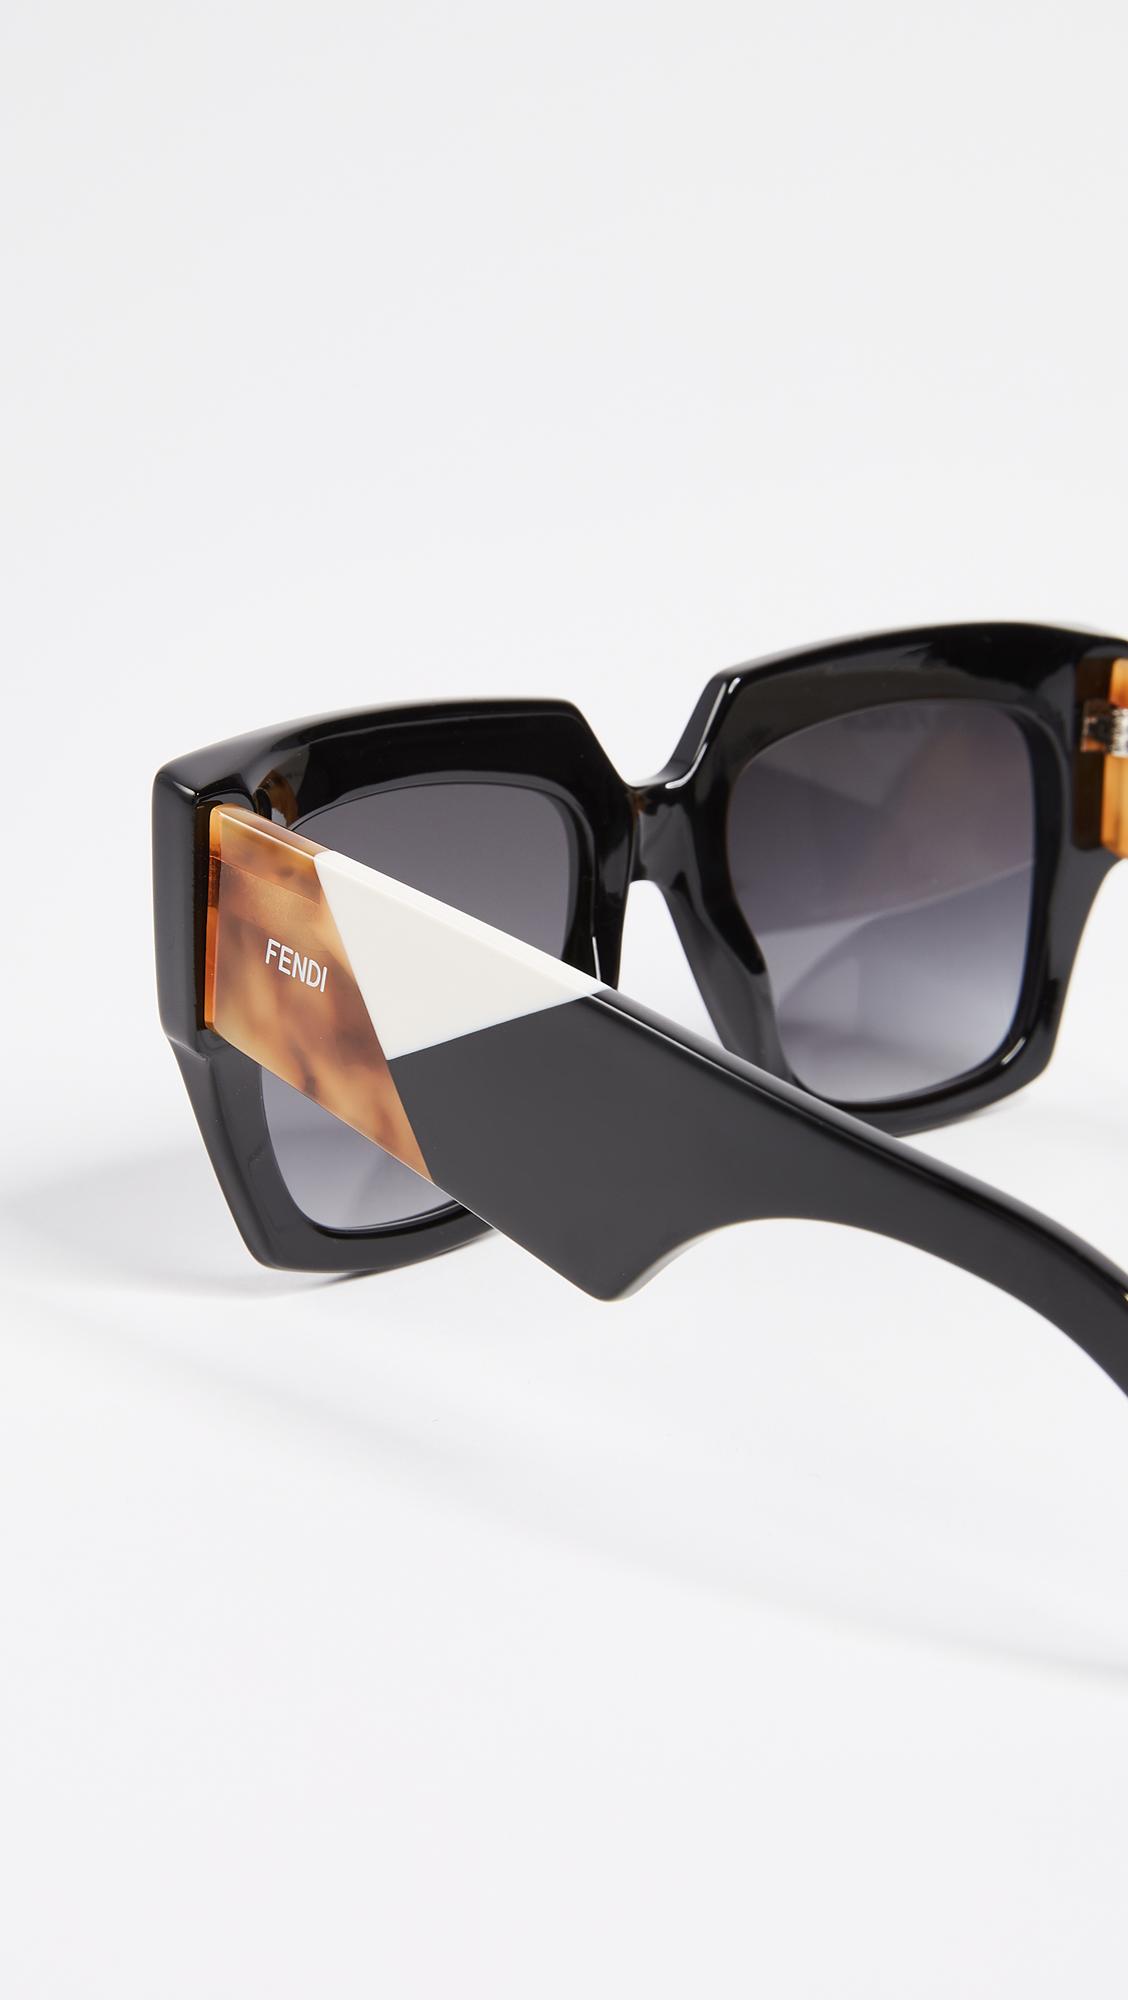 9be808e51c9b0 Fendi Square Colorblock Sunglasses